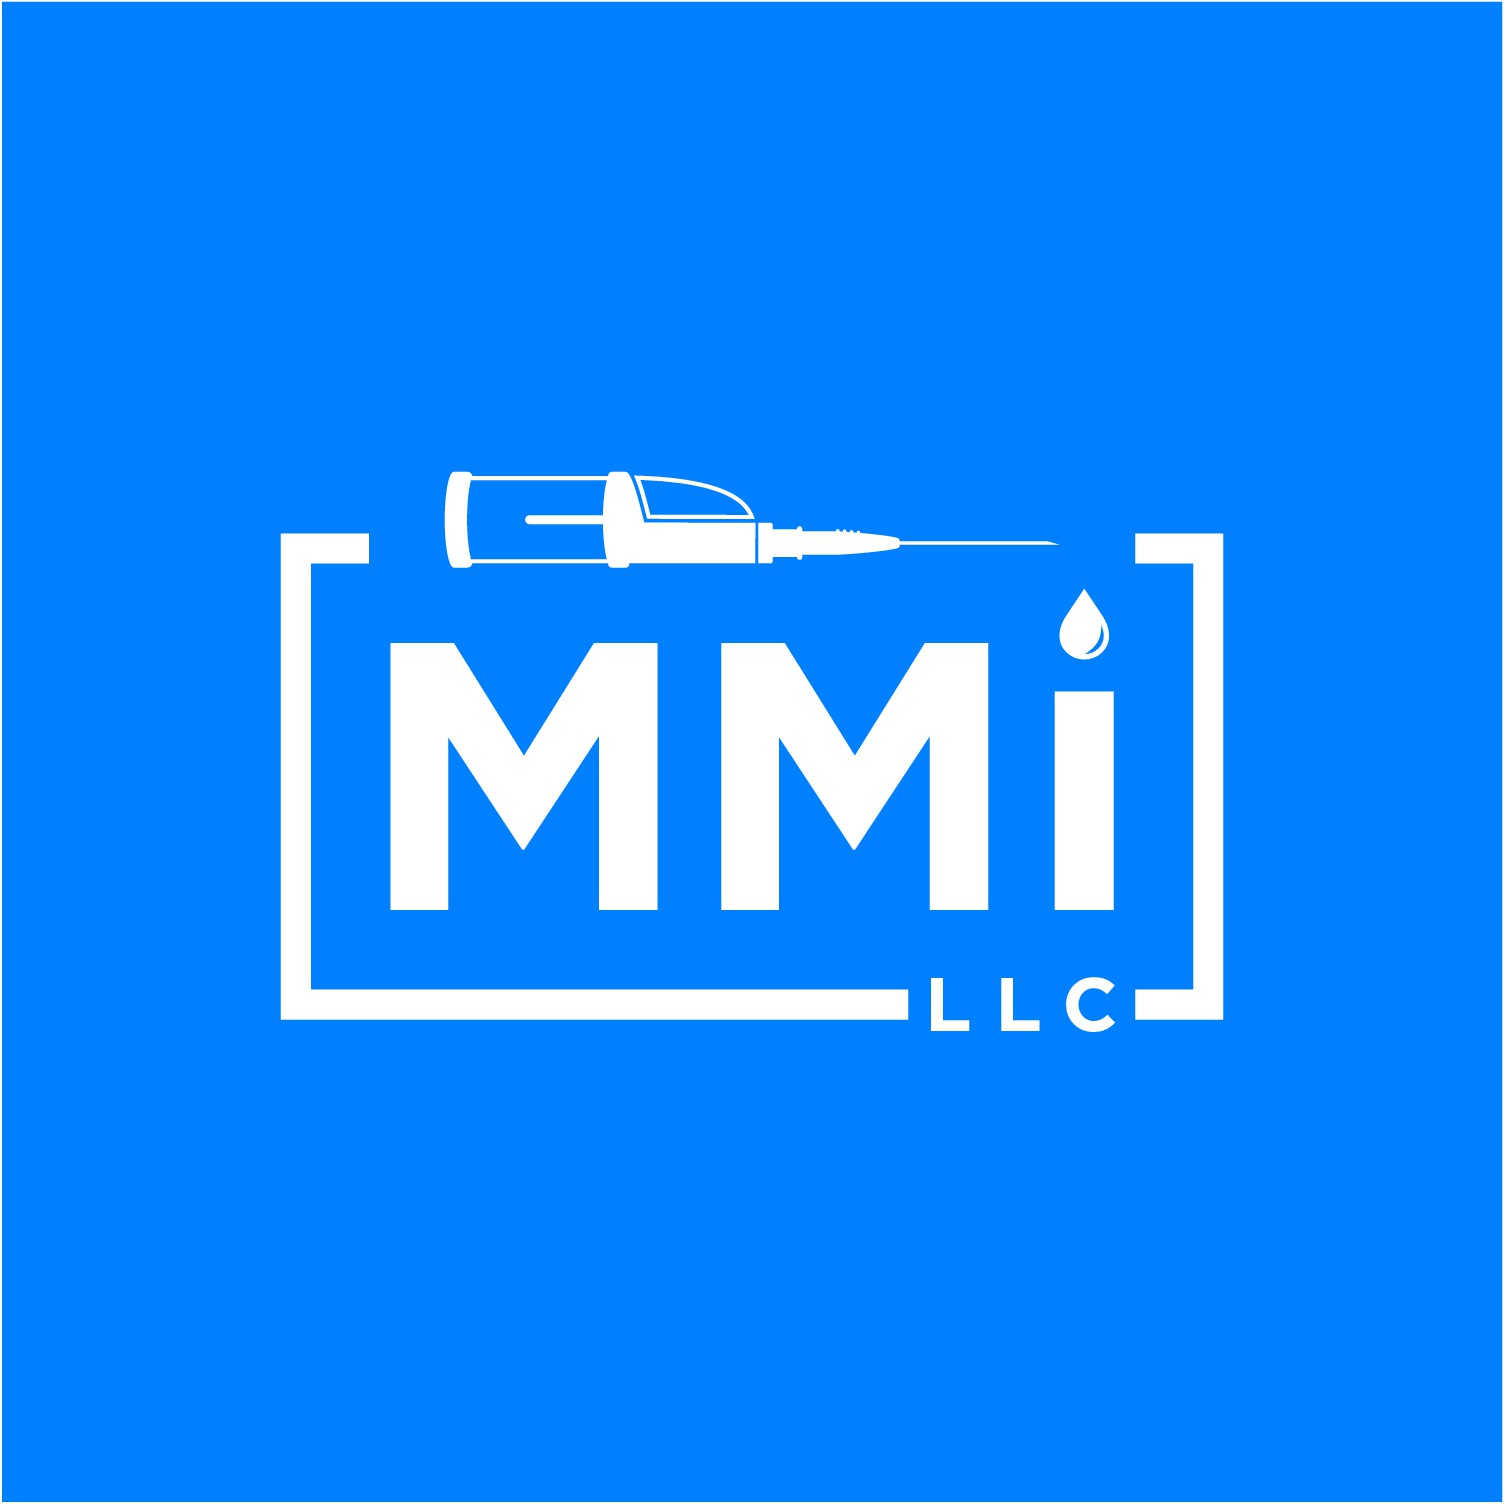 Medical needle company needs a cool logo